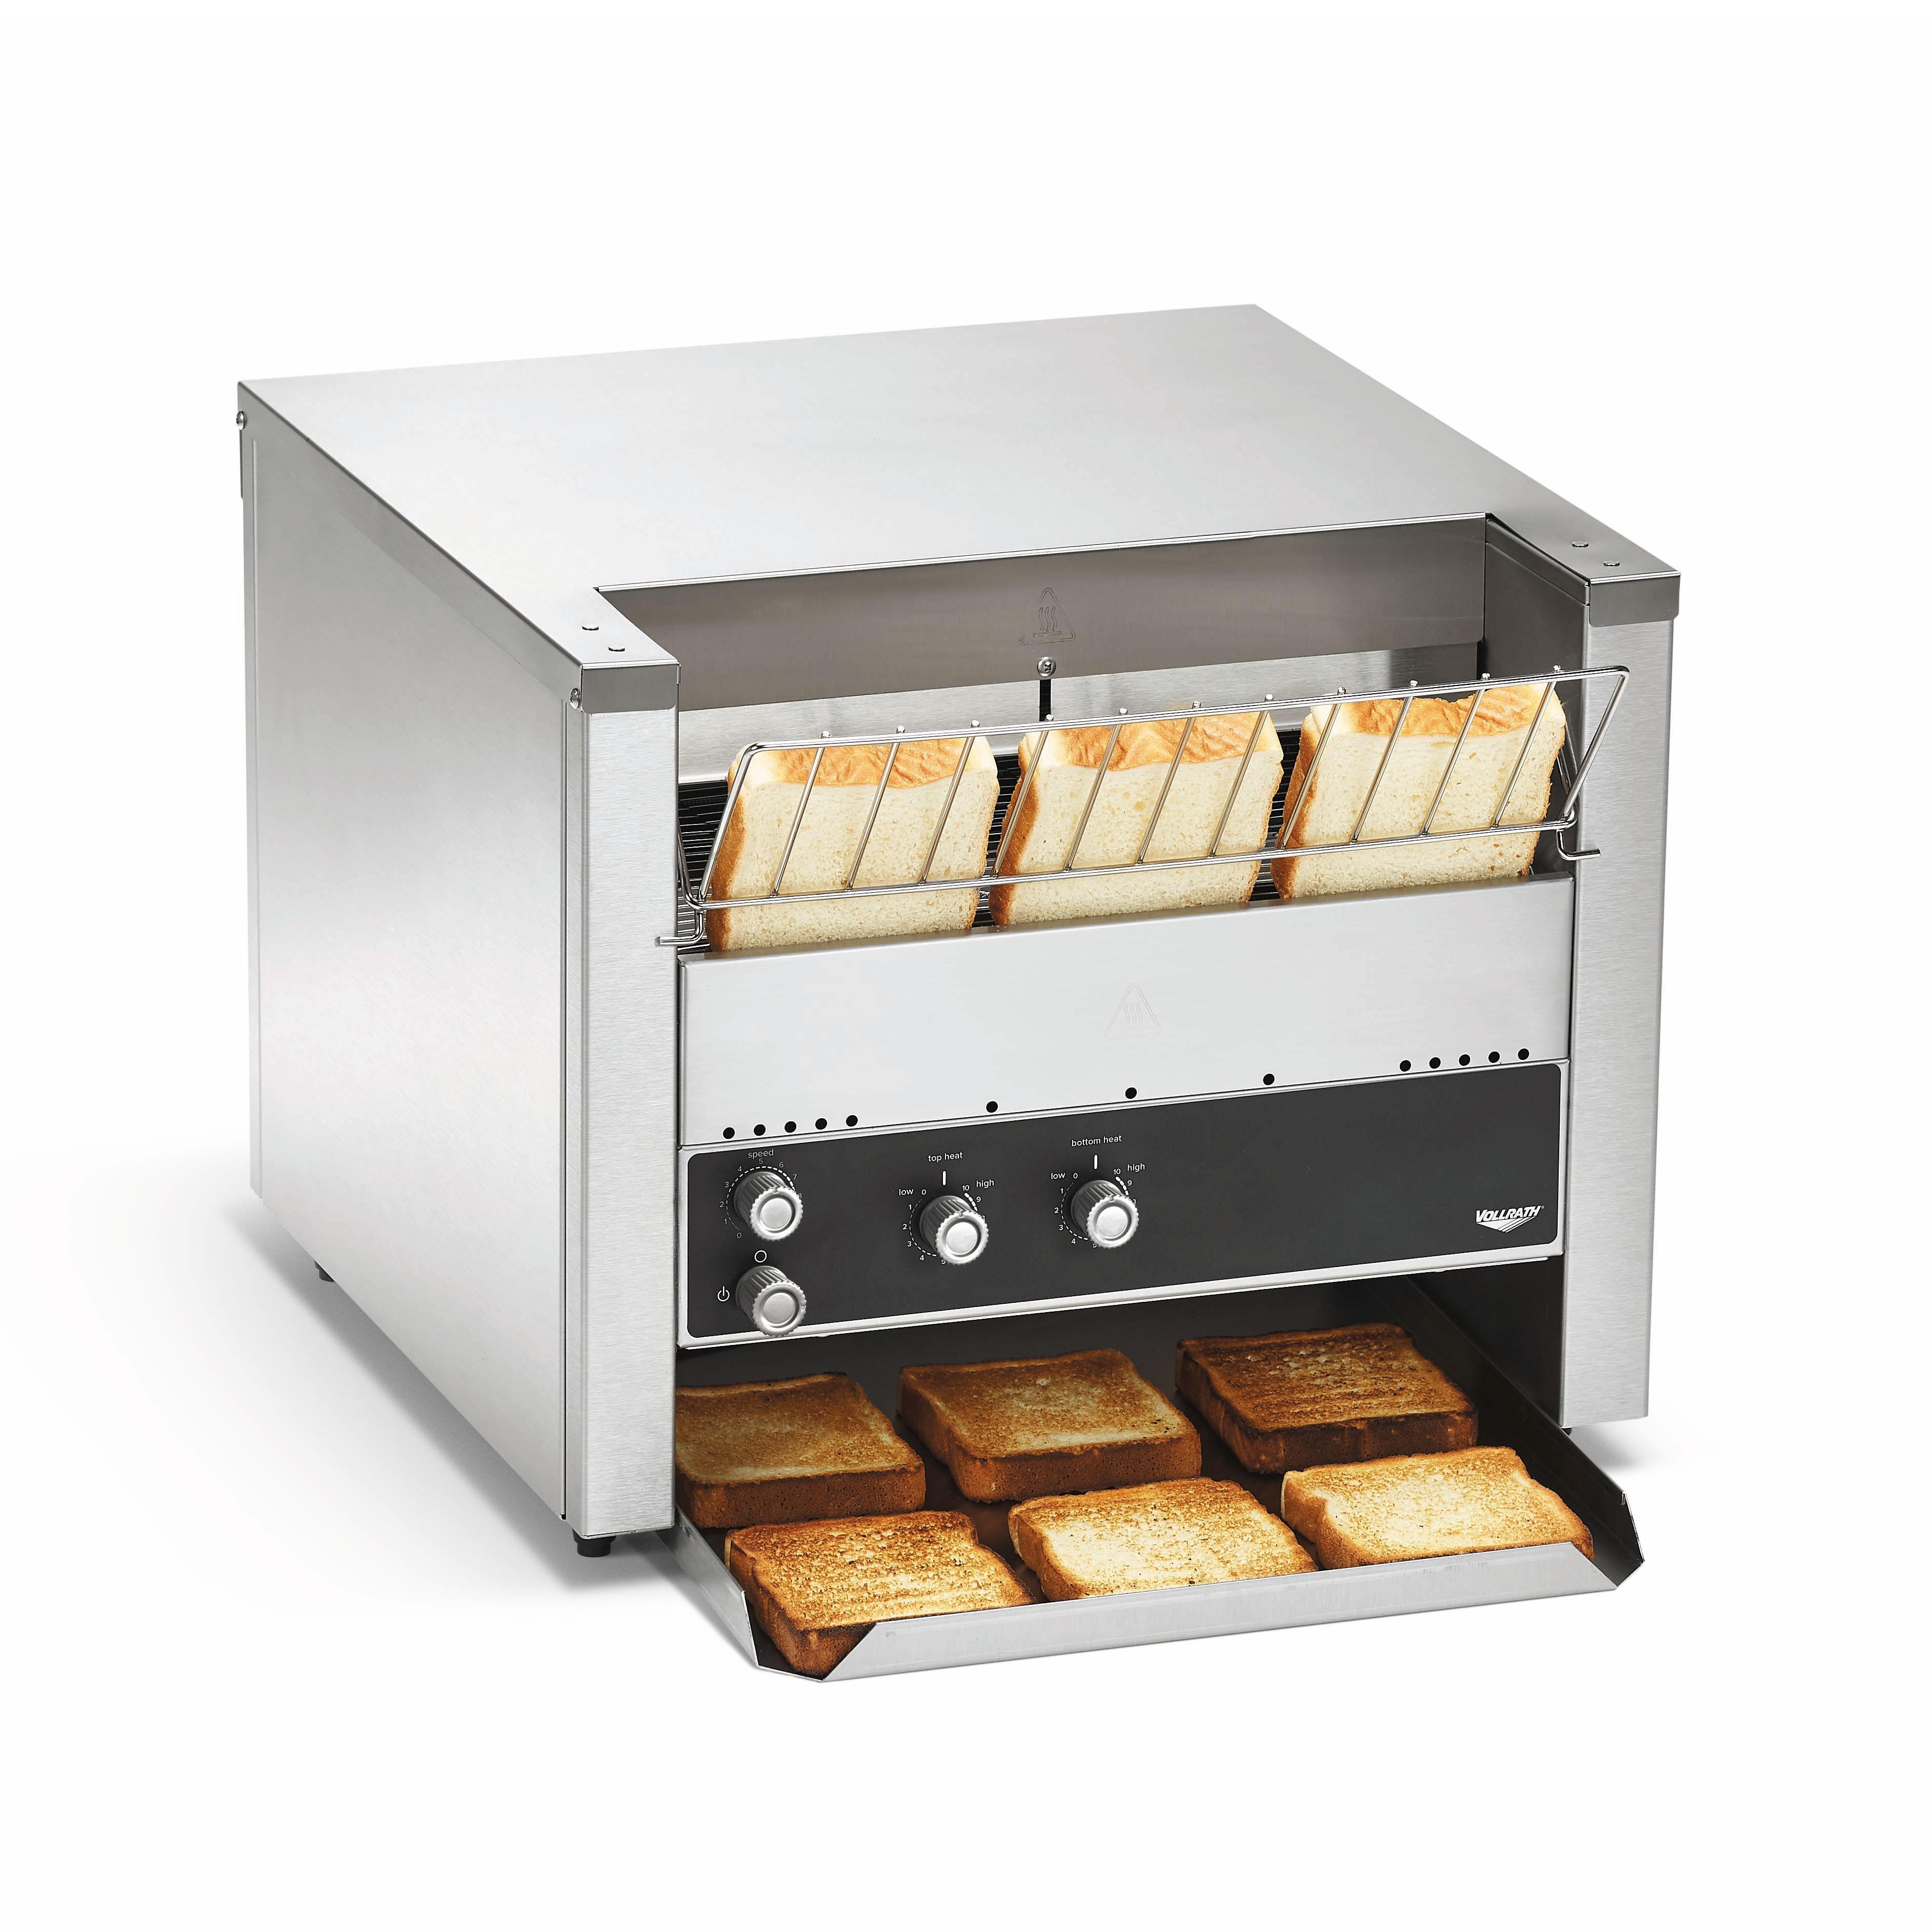 Vollrath CT4H-220950 toaster, conveyor type